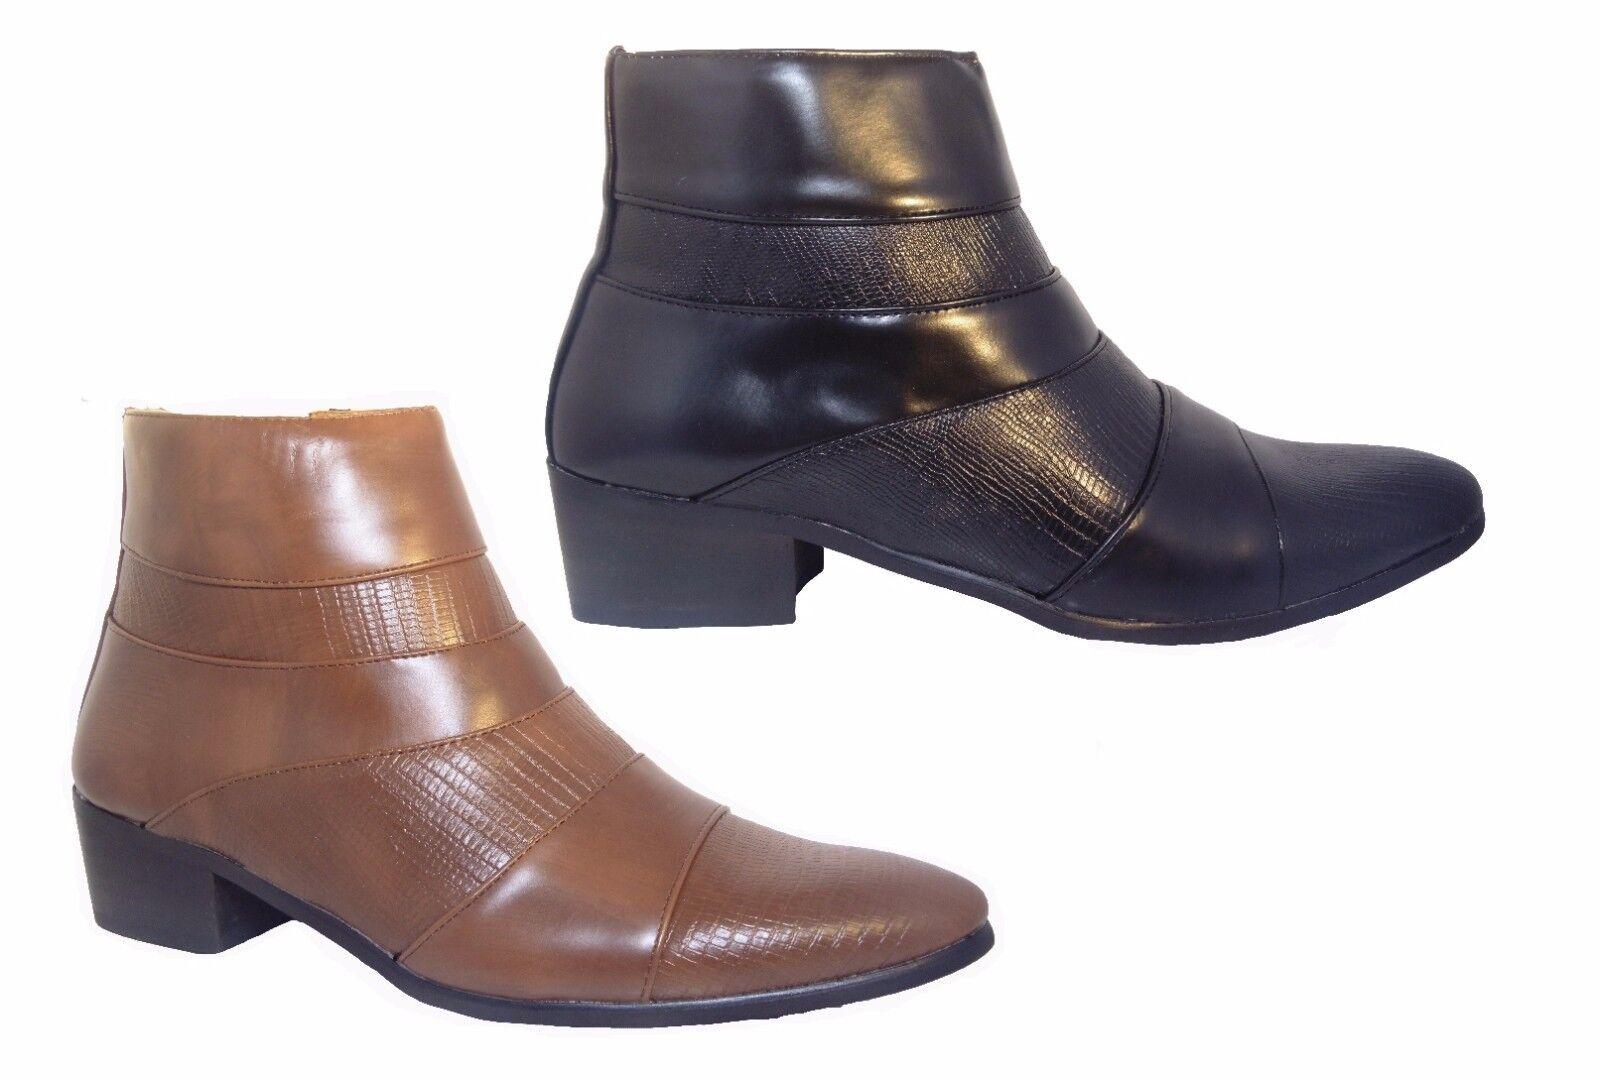 Men's New Cuban Heels zip Ankle 6 Boots Black Brown Size 6 Ankle 7 8 9 10 11 UK 15aaf2